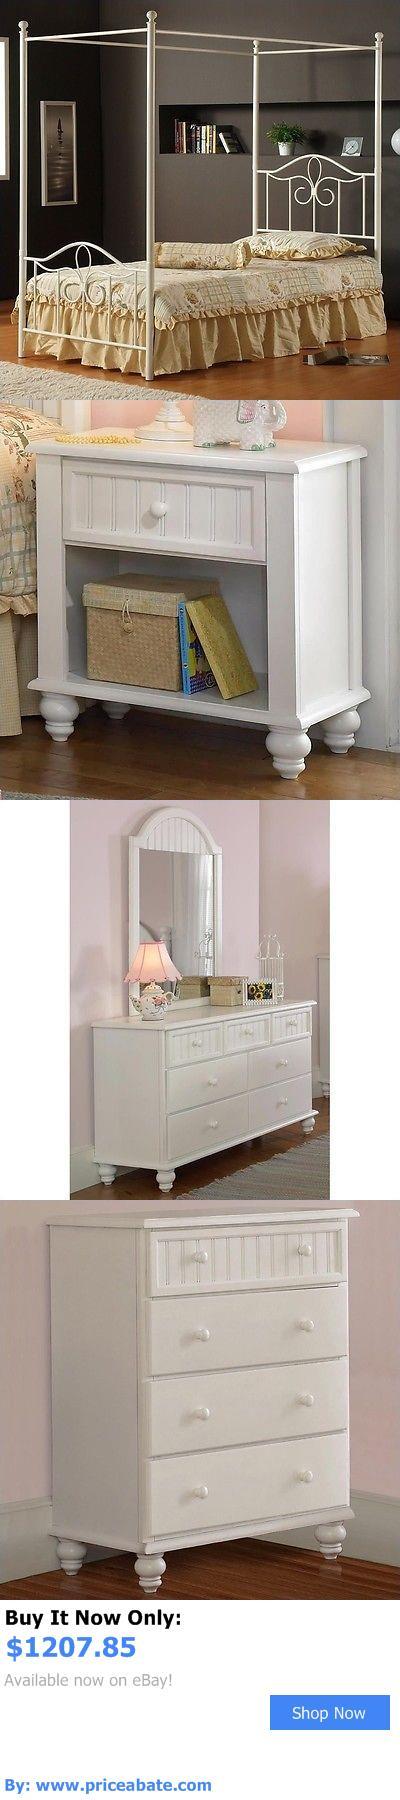 Bedding: Hillsdale Westfield Metal Canopy Bed 5 Piece Bedroom Set In Off White-Twin BUY IT NOW ONLY: $1207.85 #priceabateBedding OR #priceabate